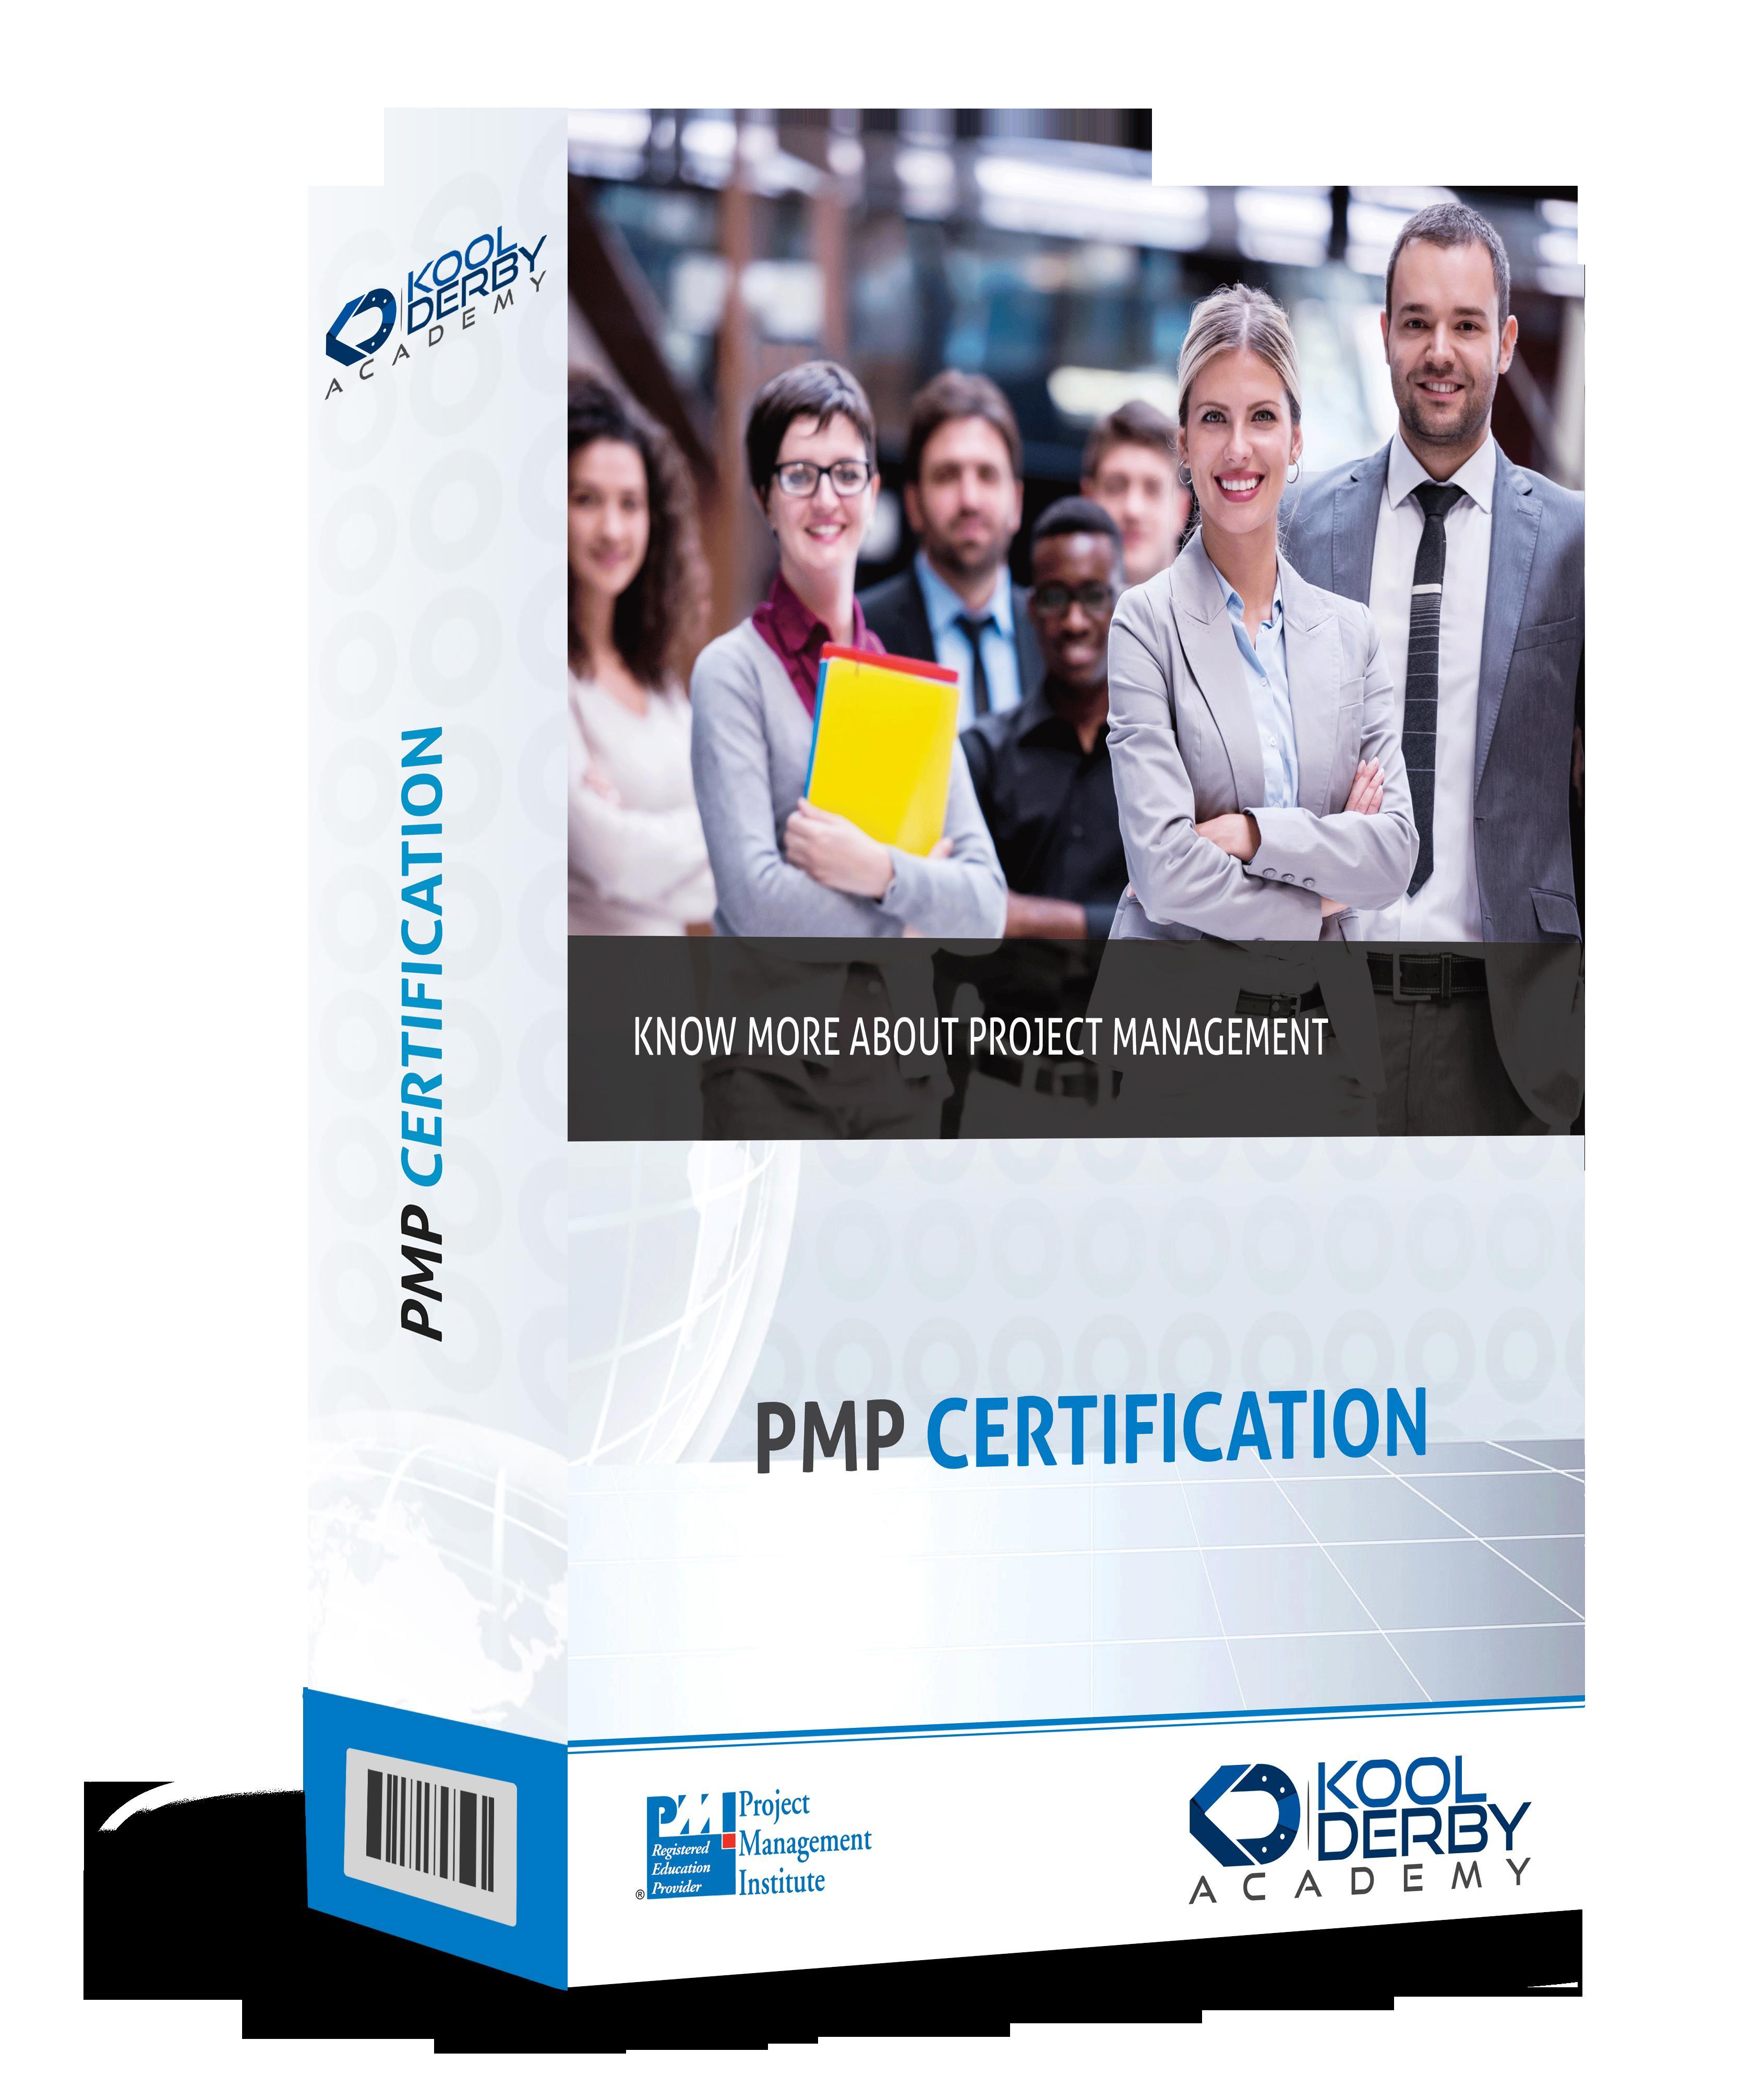 Pmp certification texas september pm certification xflitez Images